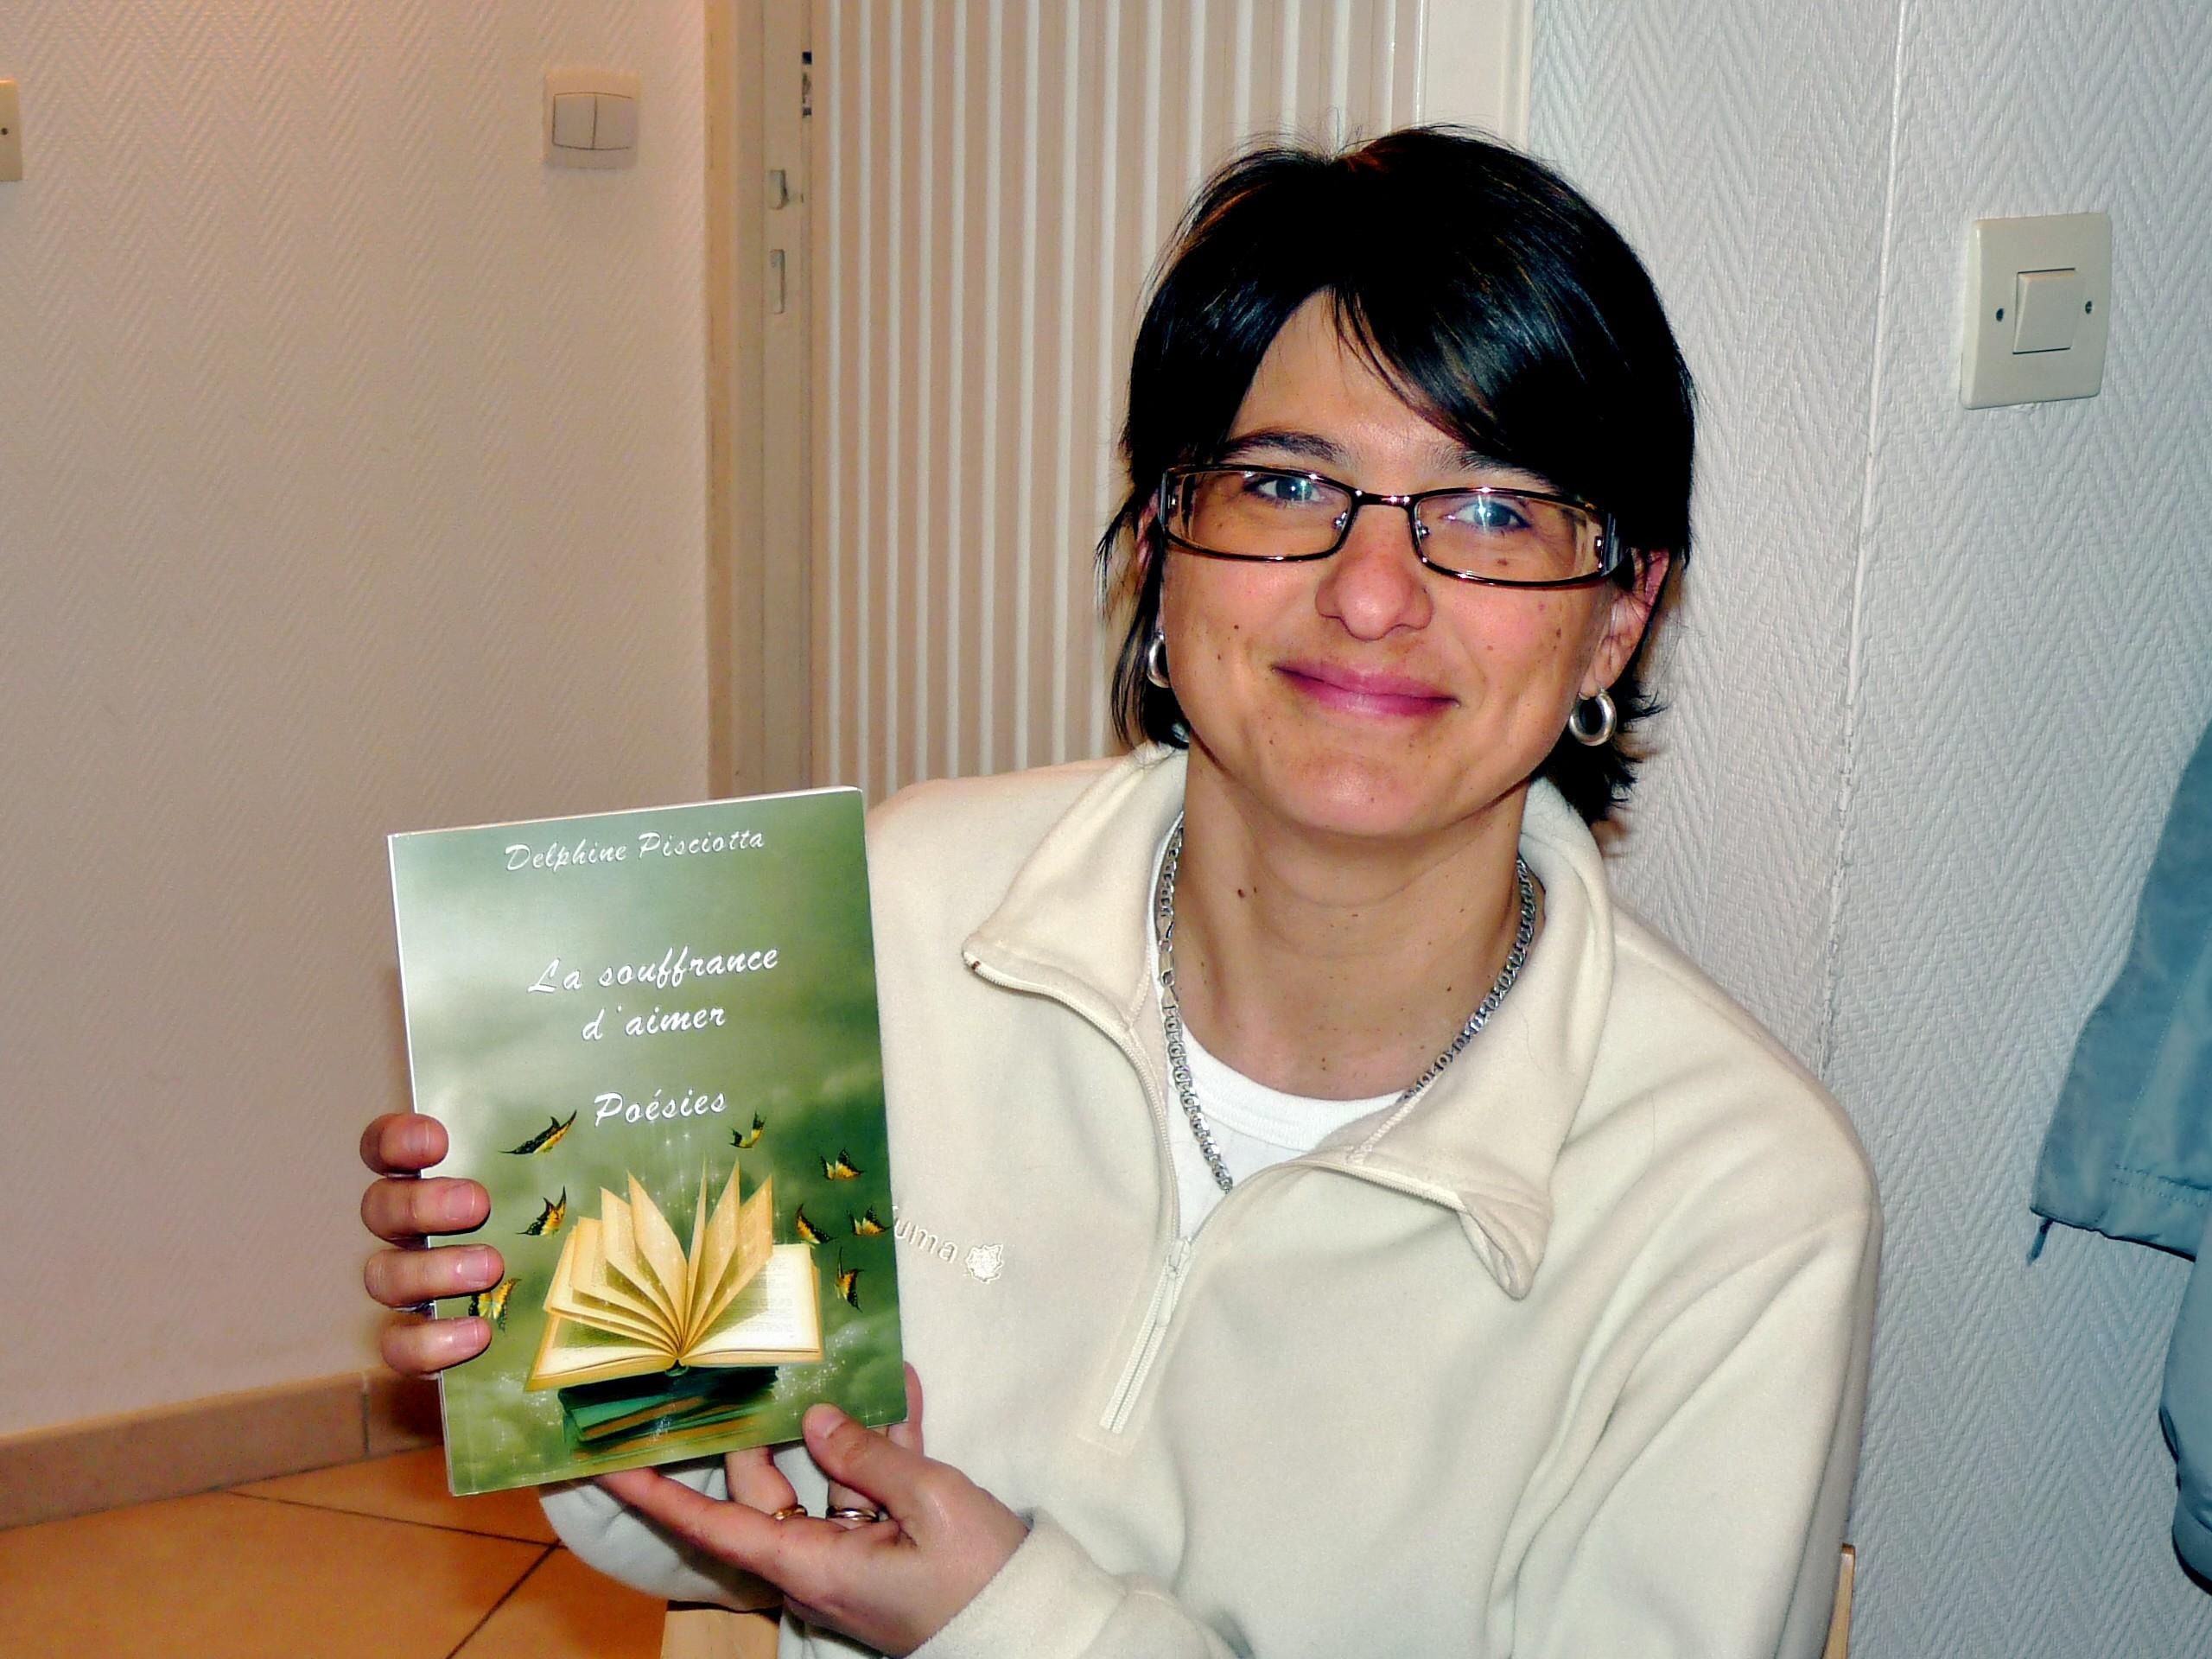 Delphine Pisciotta